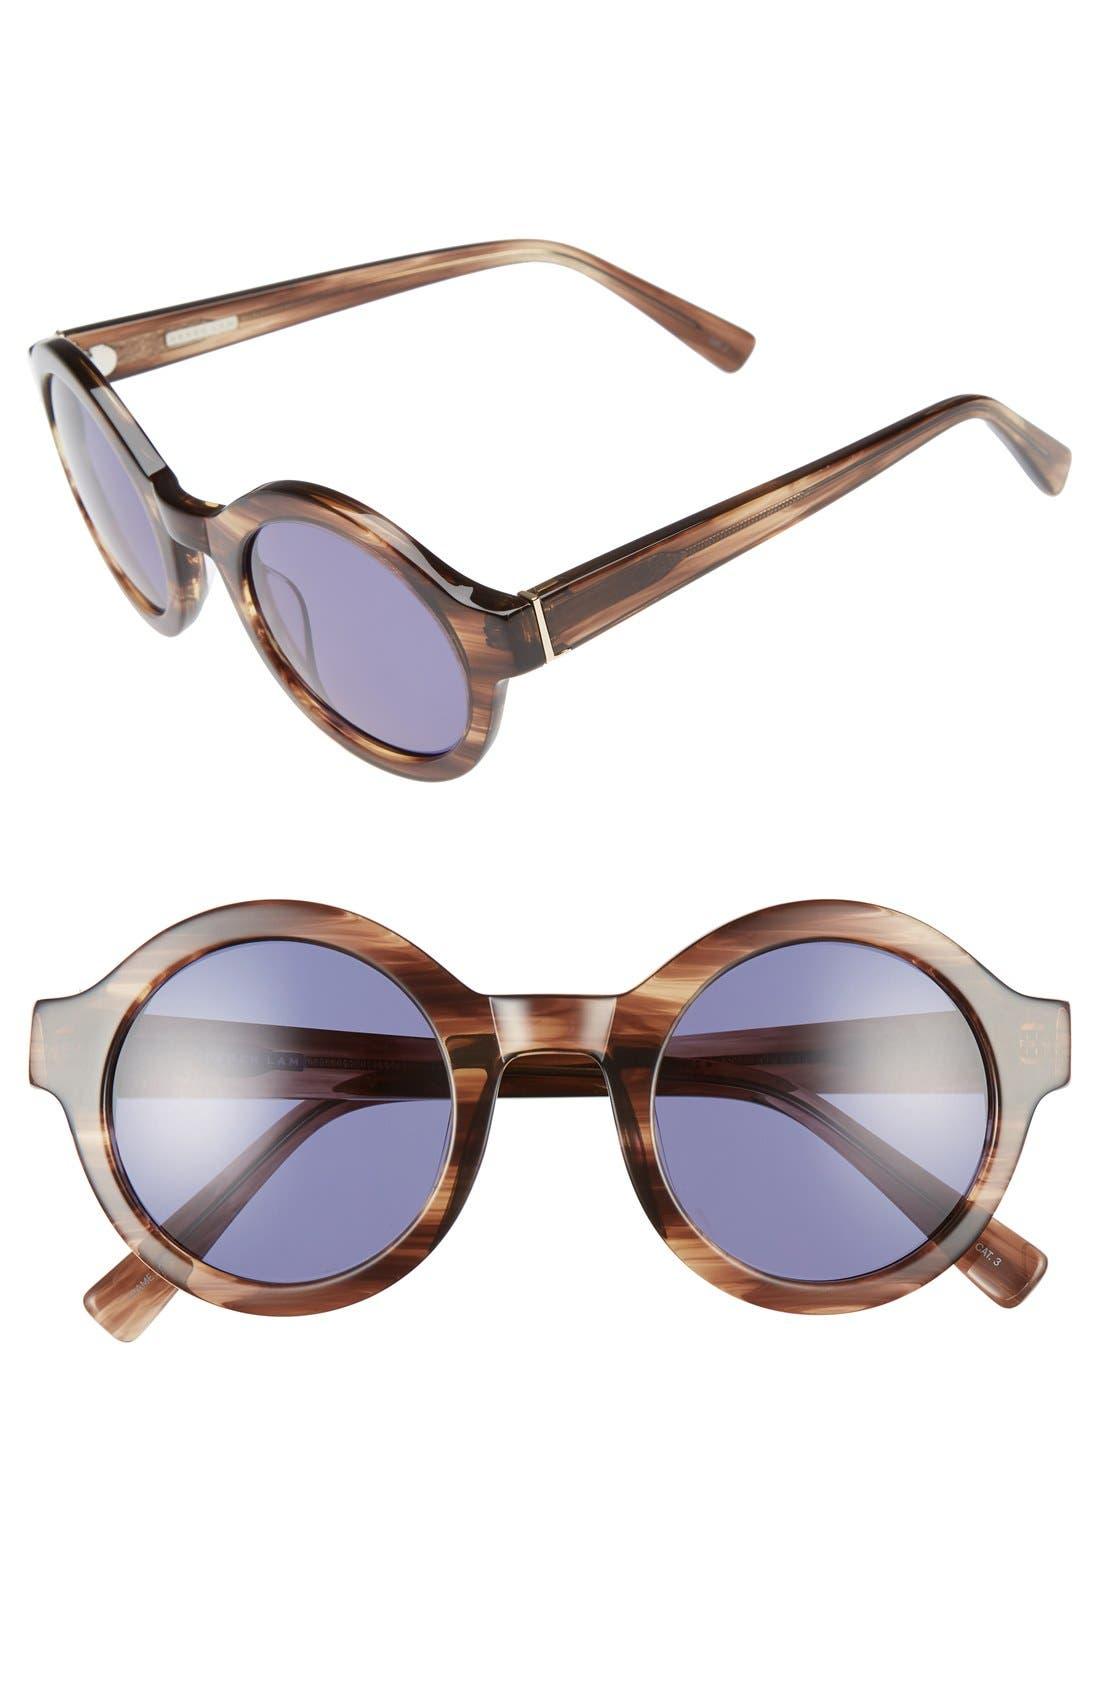 Derek Lam 'Luna' 47mm Round Sunglasses